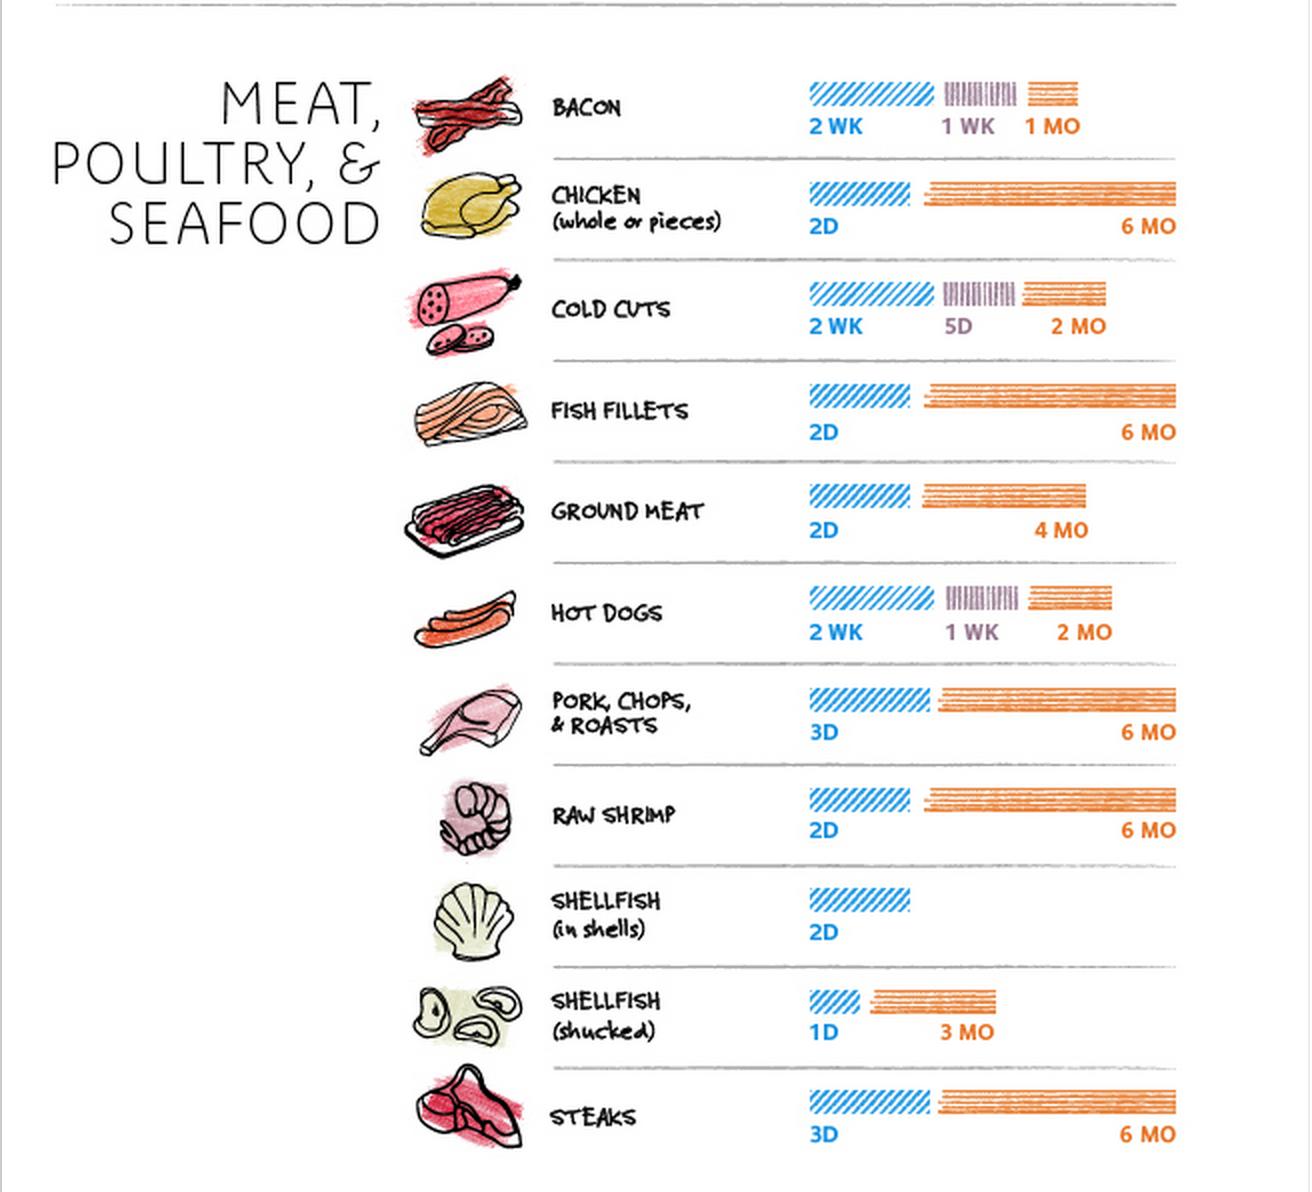 Food Storage Chart So Food Never Goes Bad